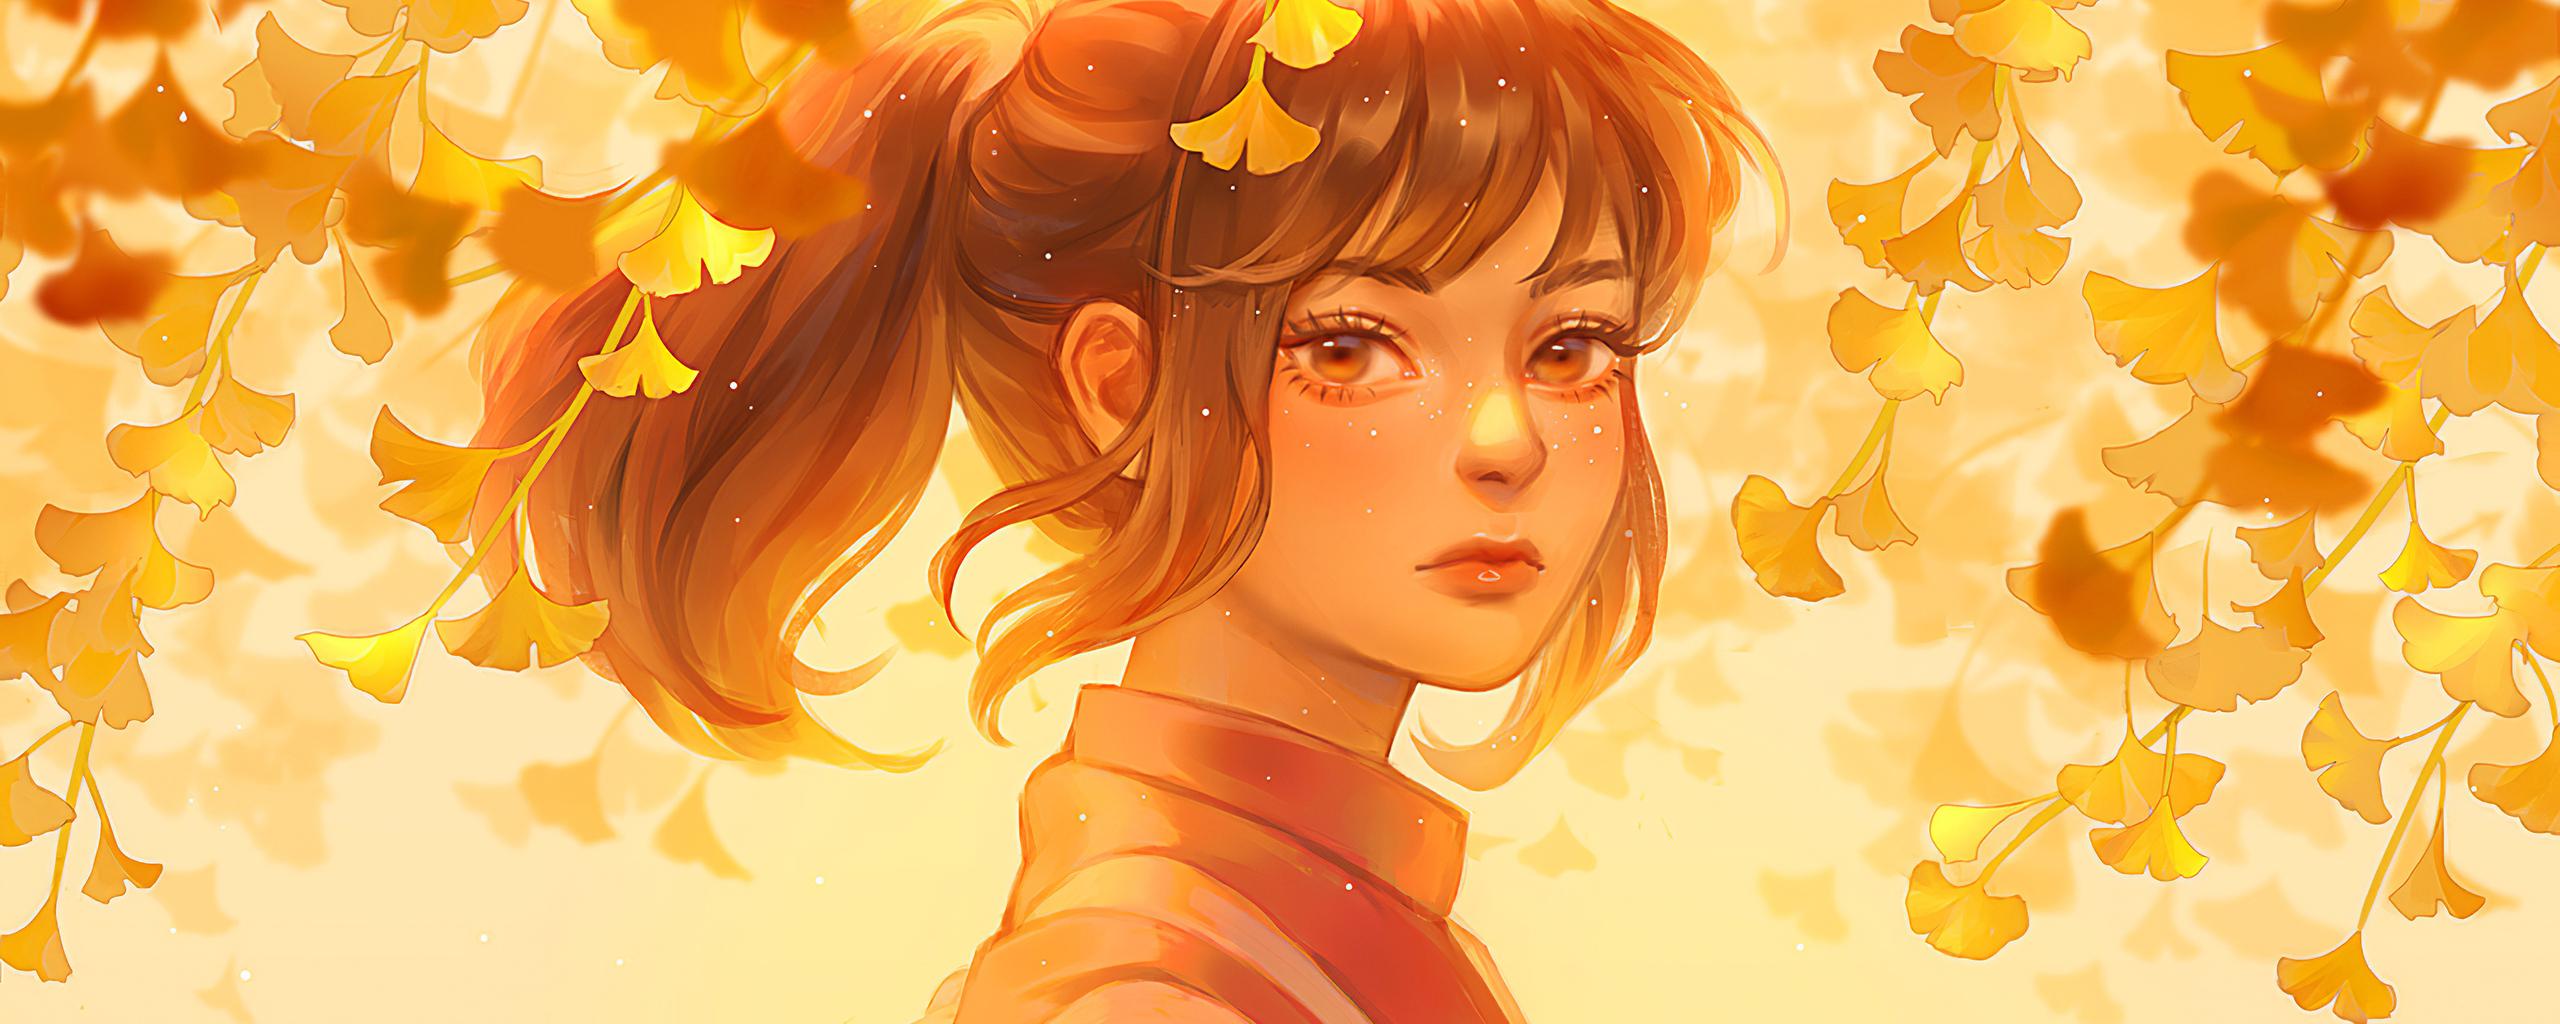 anime-girl-spirtied-away-4k-u5.jpg